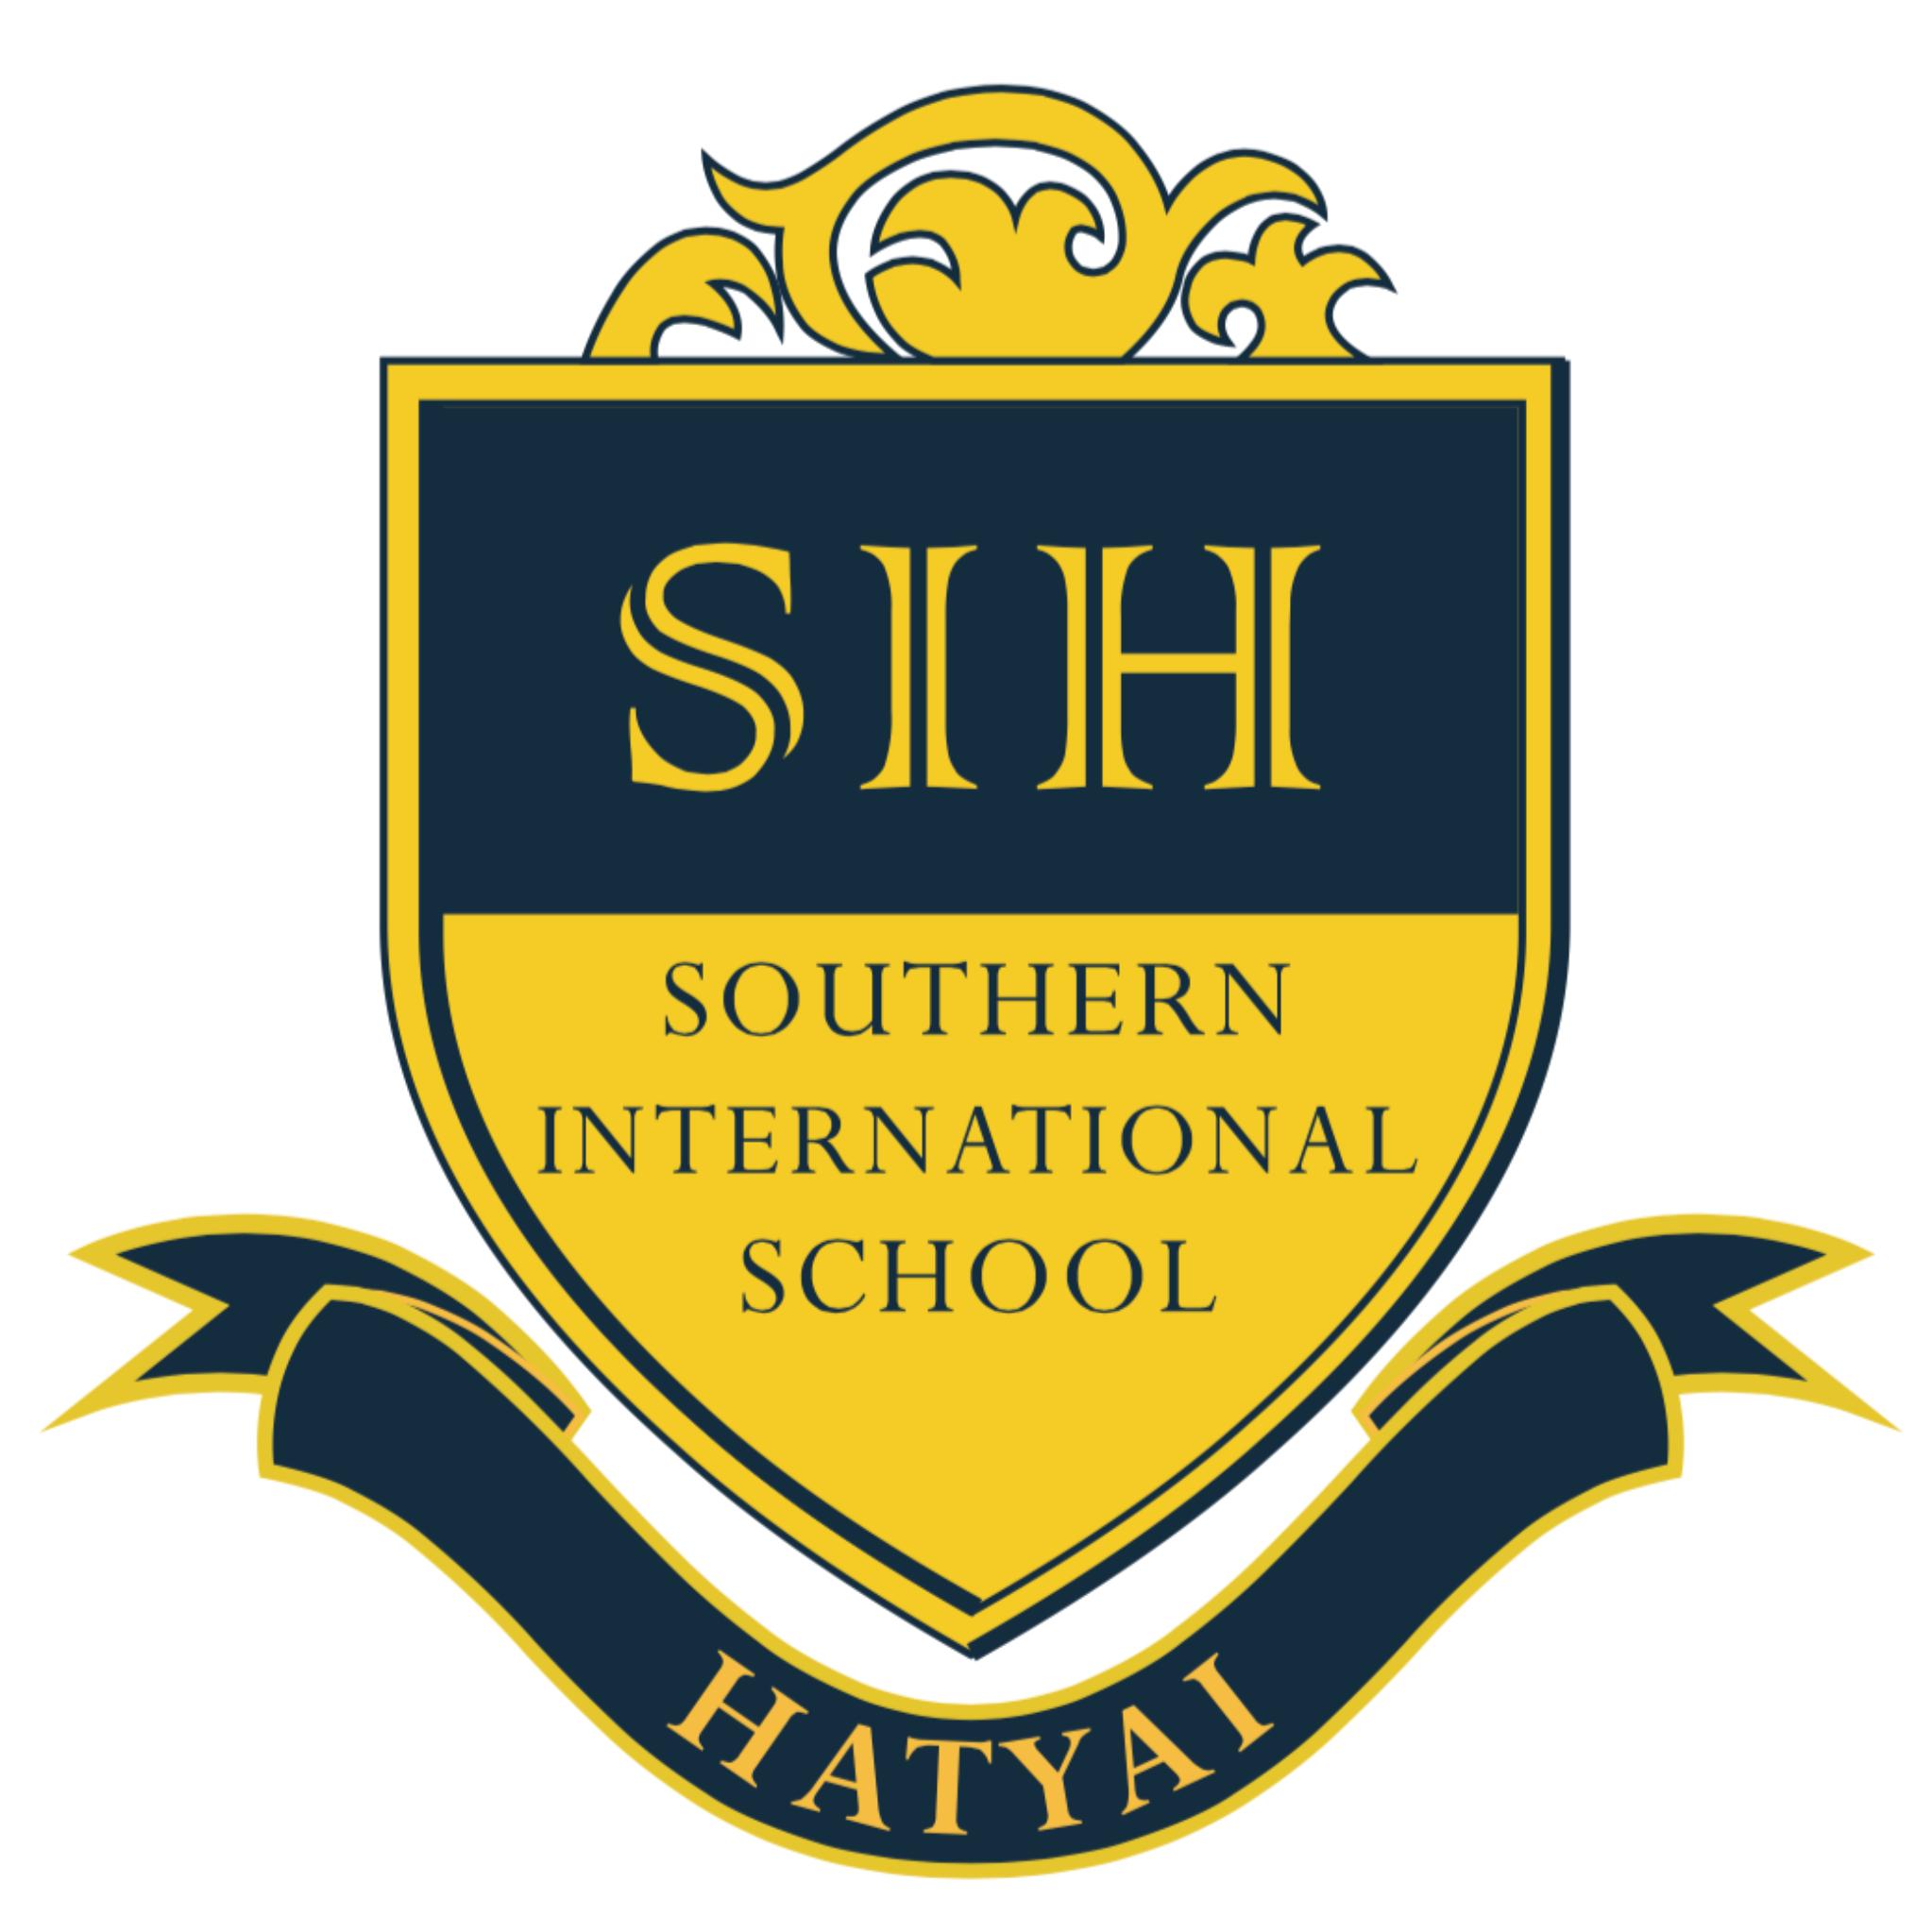 Southern International School